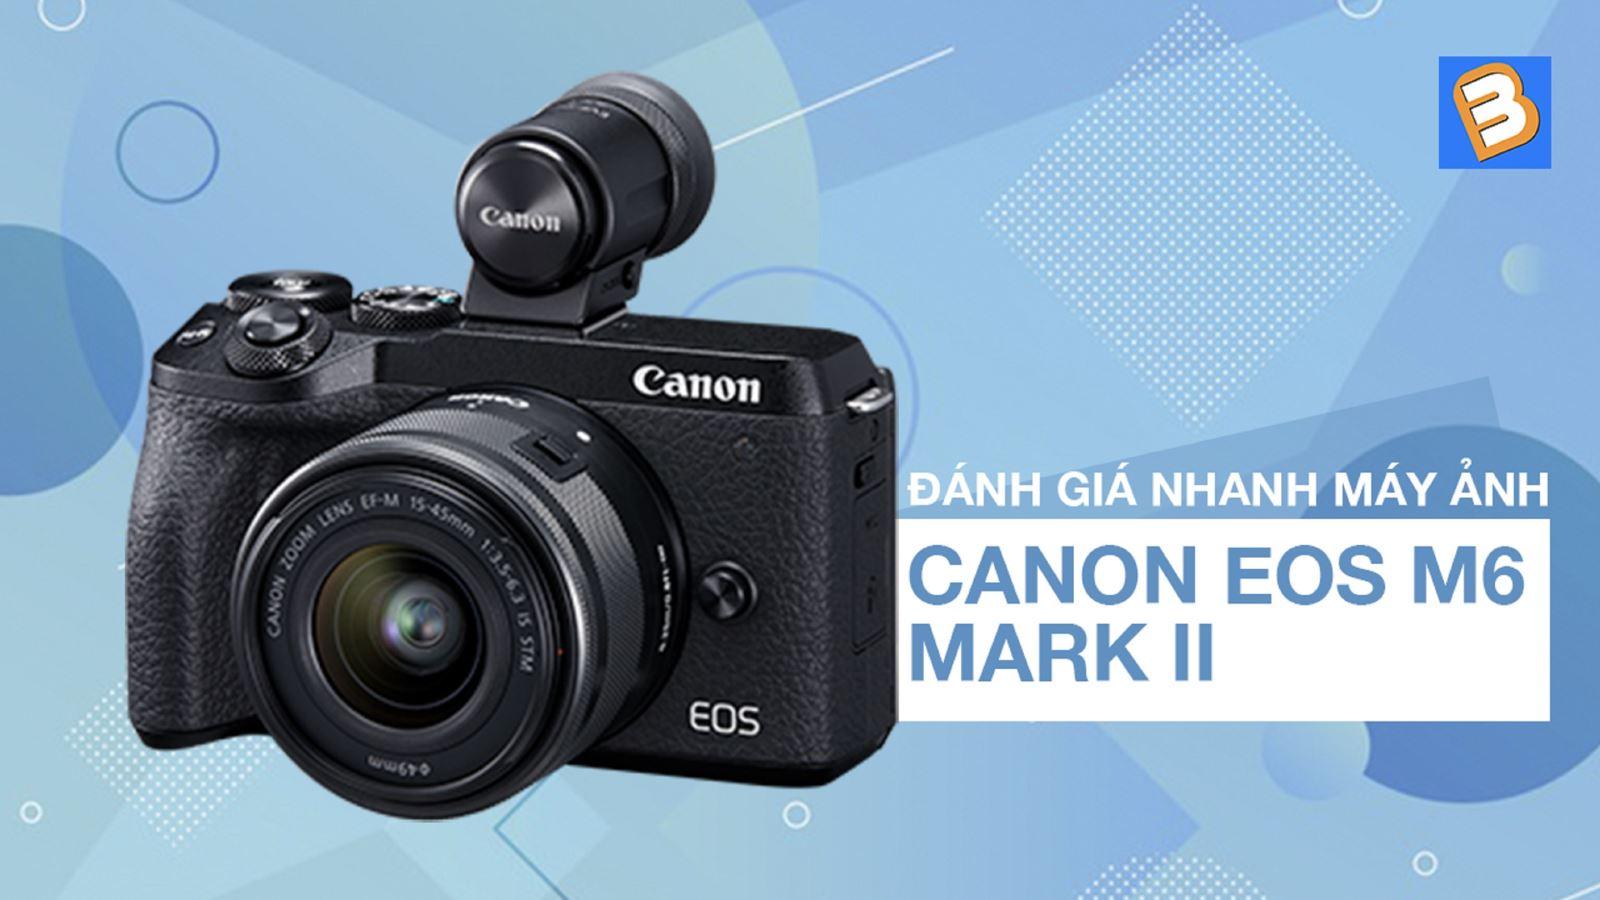 Đánh giá nhanh máy ảnhCanon EOS M6 Mark II